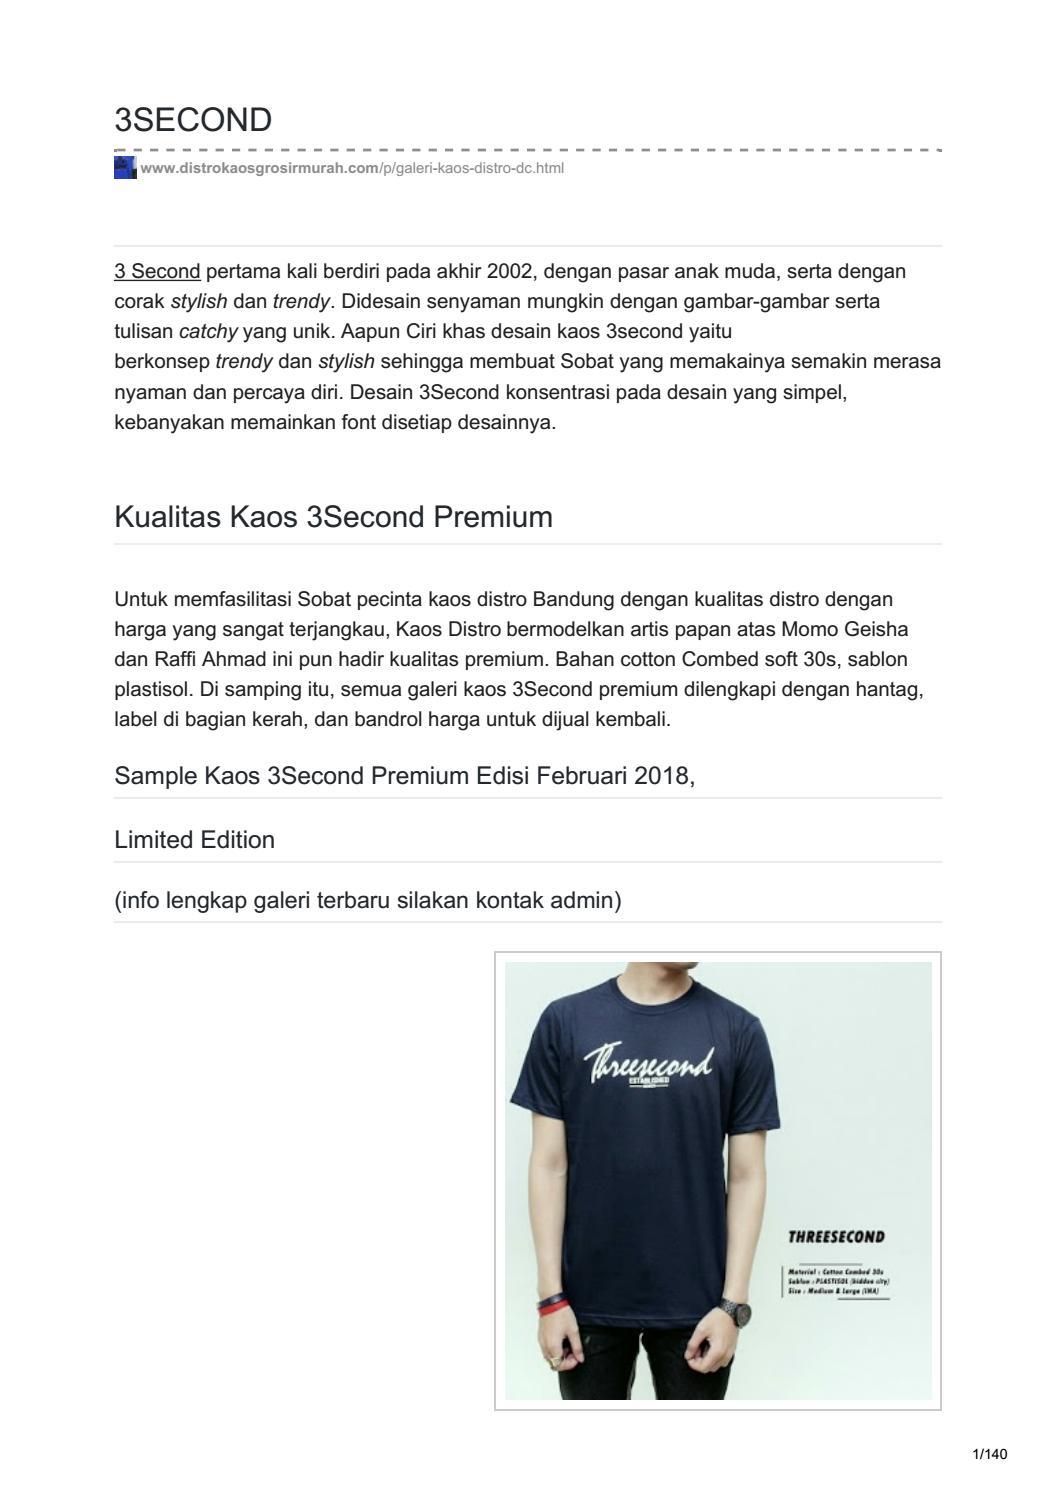 Daftar Harga Jaket 3second Premium Termurah 2018 Tshirt 166031812kn Kuning Xl Distrokaosgrosirmurah Com By Iji90 Issuu